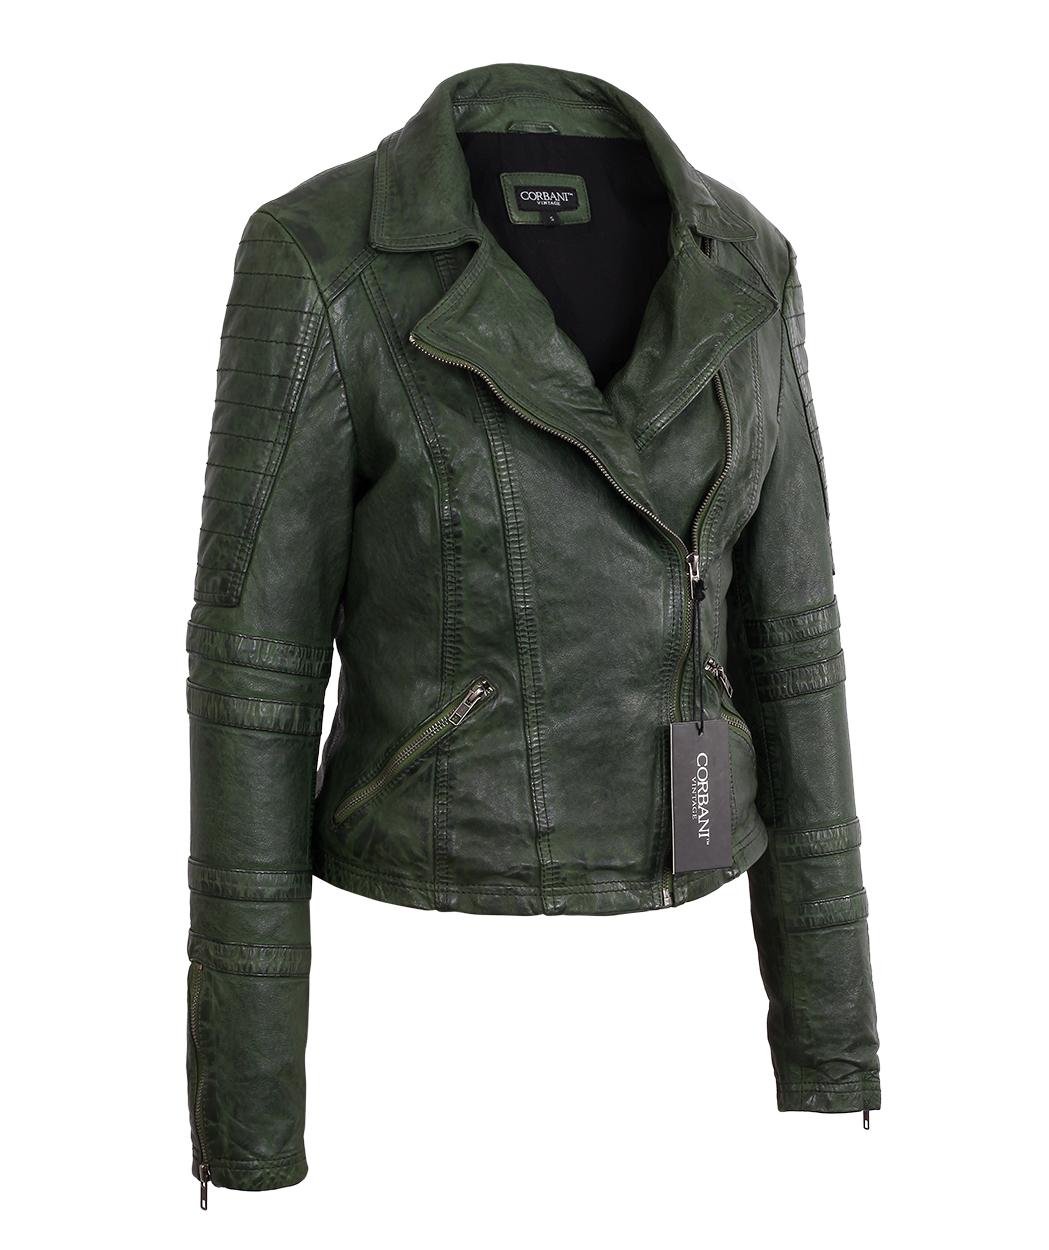 Cheap vintage leather jacket